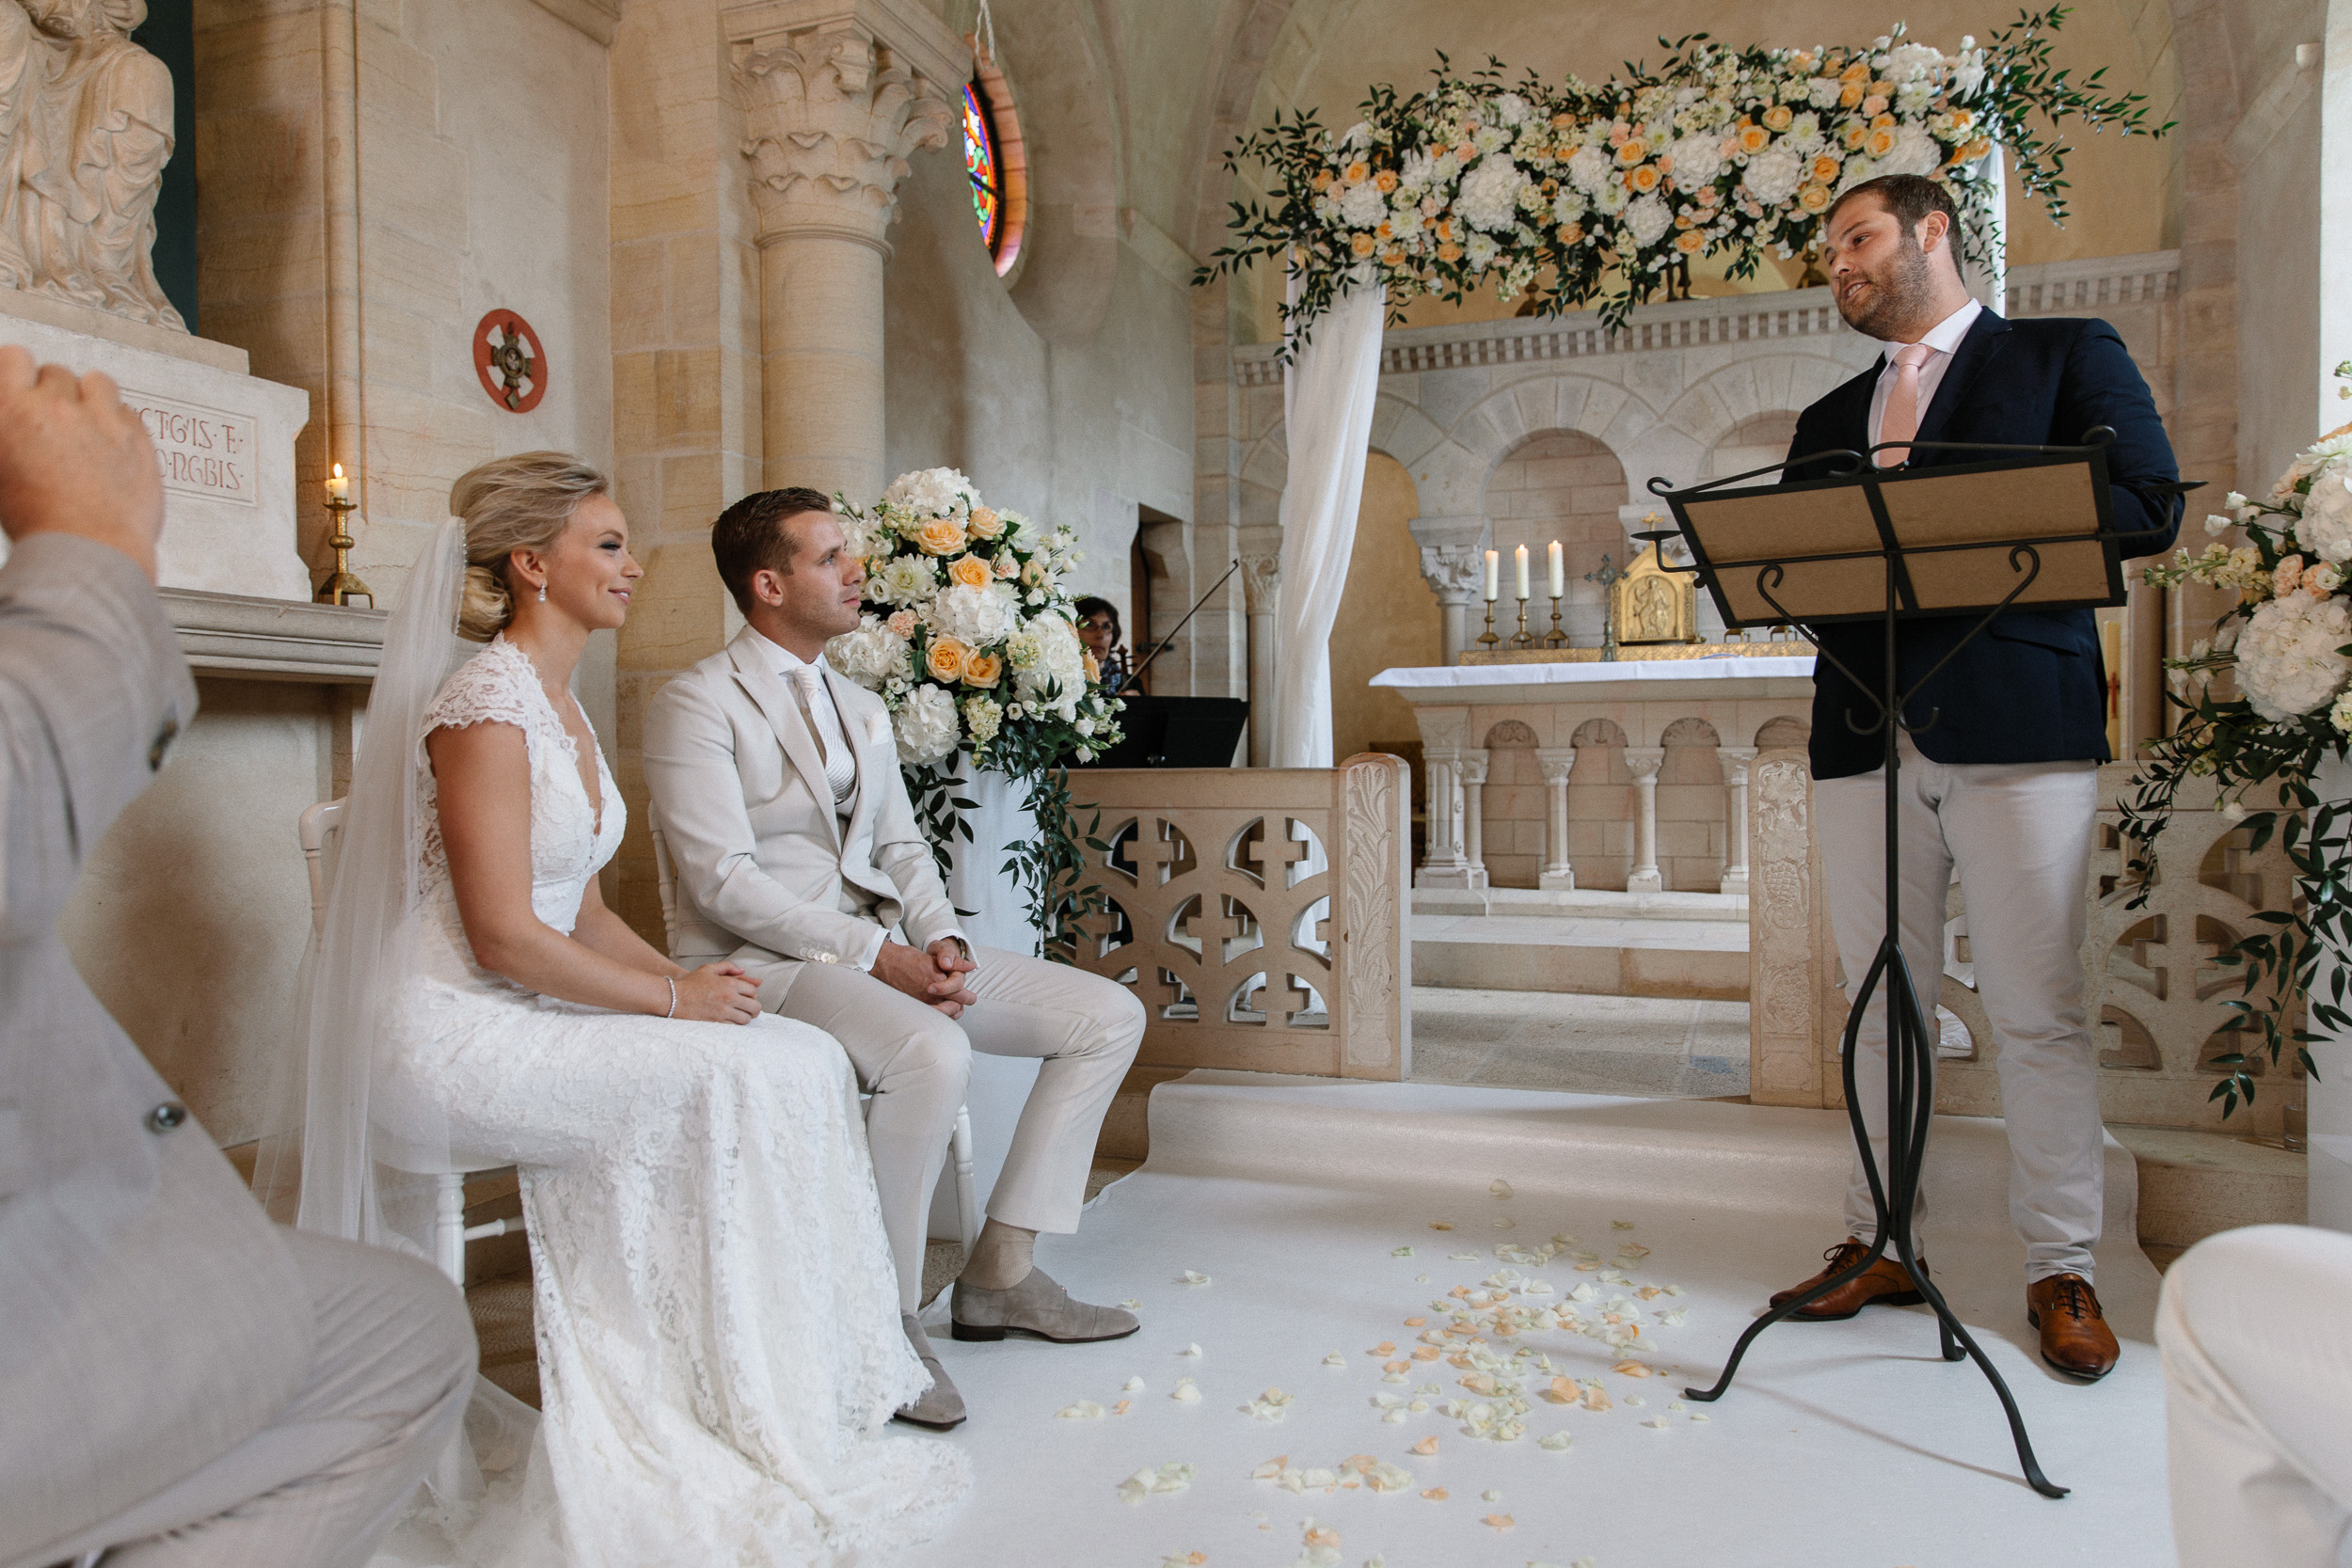 Wedding-Chateau-de-Varennes-044.jpg